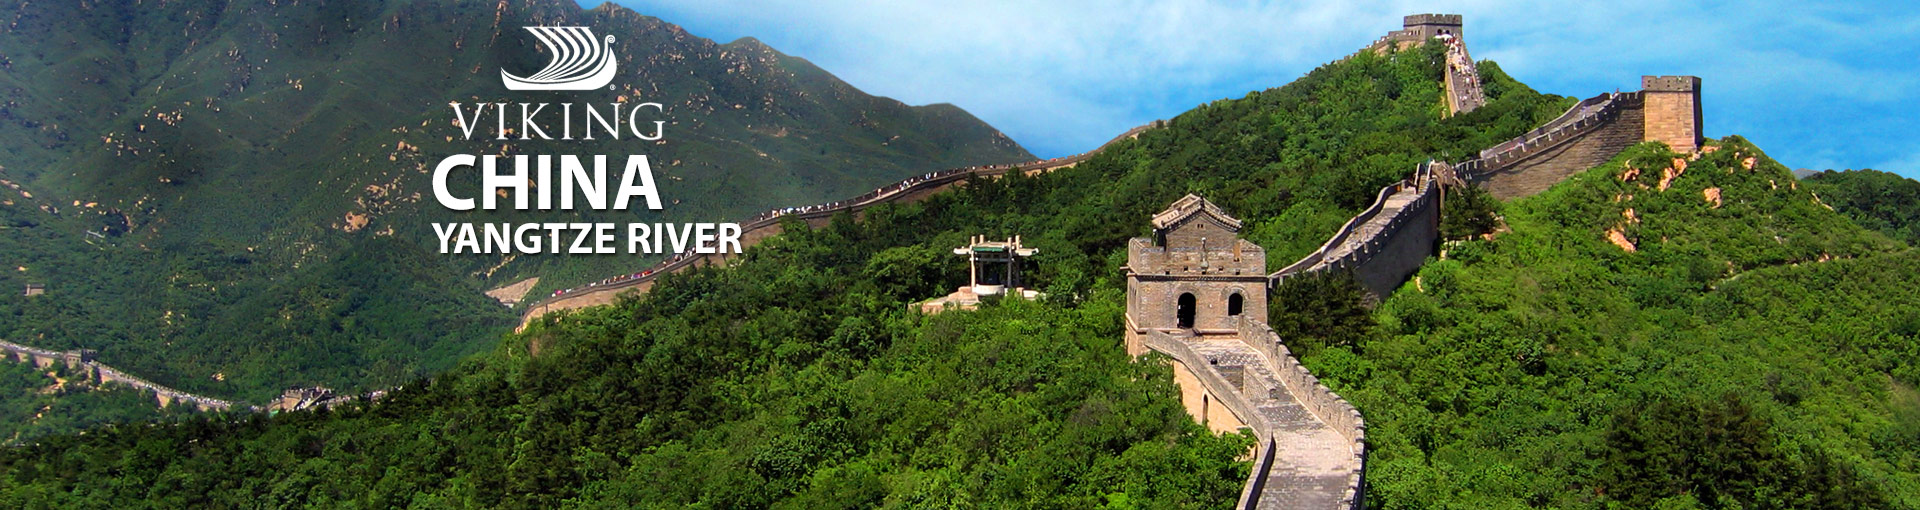 Viking River Cruises to China